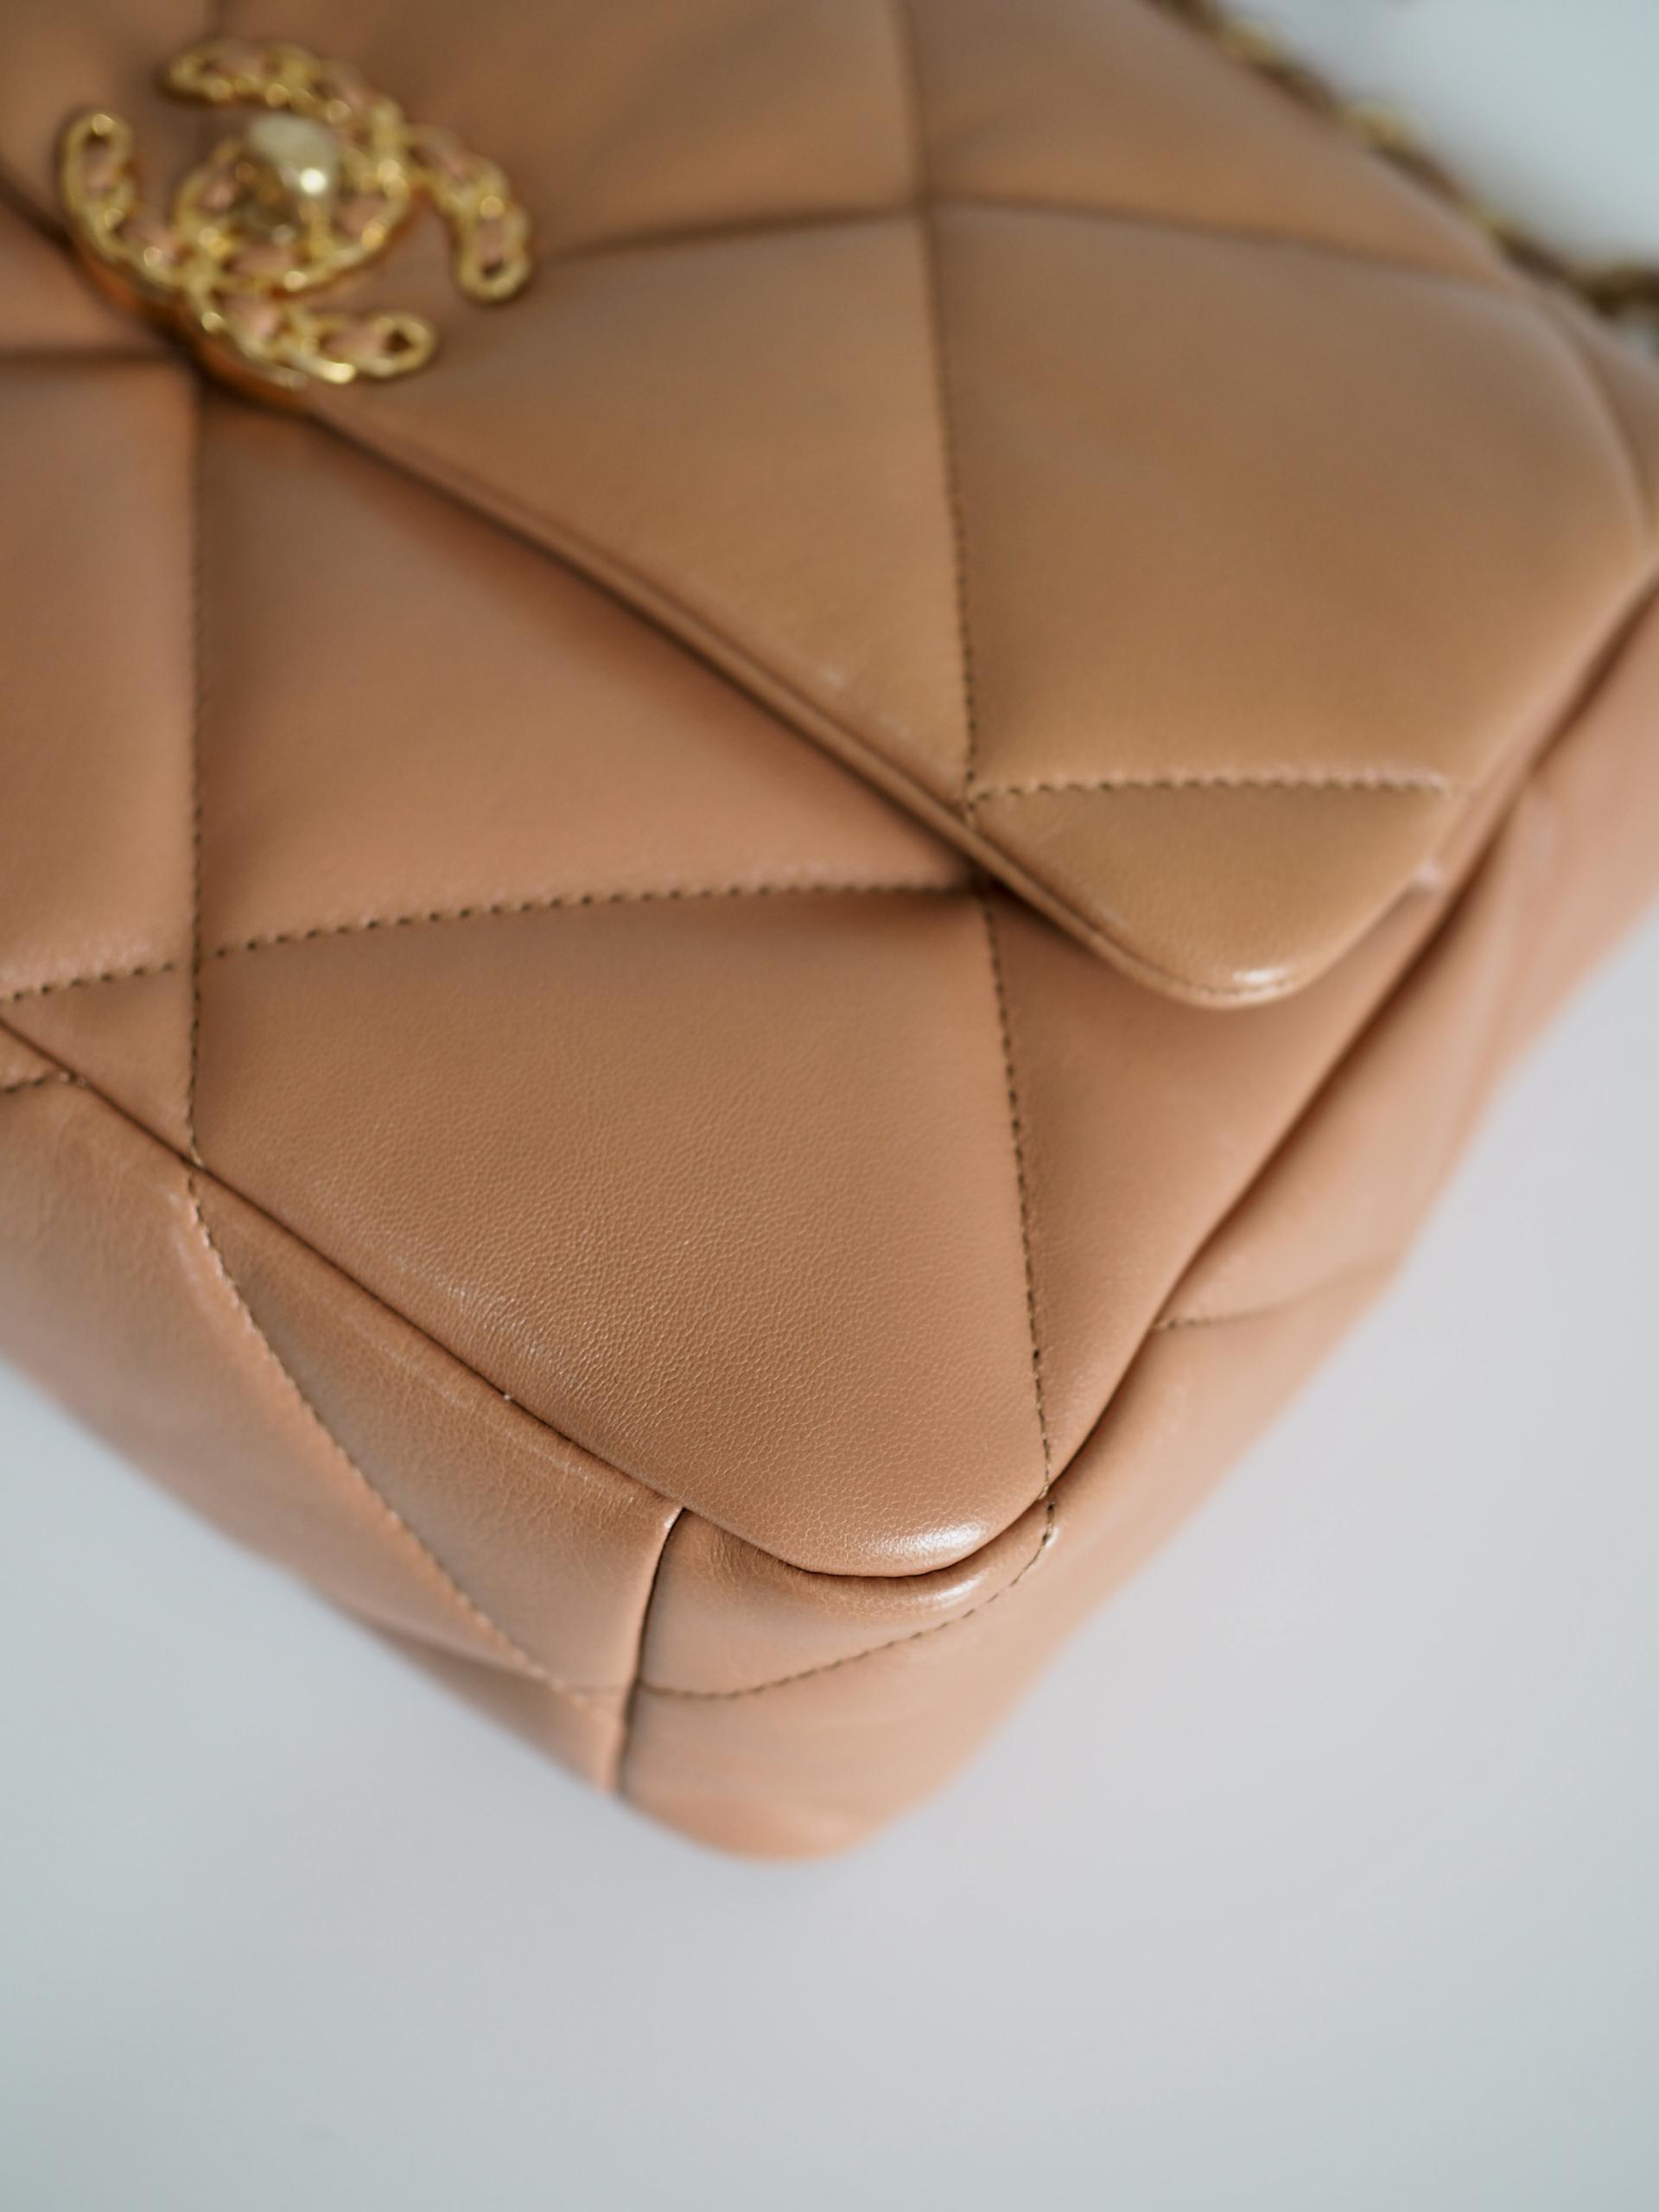 Bag CHANEL 19 Large Caramel Lambskin Gold Ruthenium Hardware